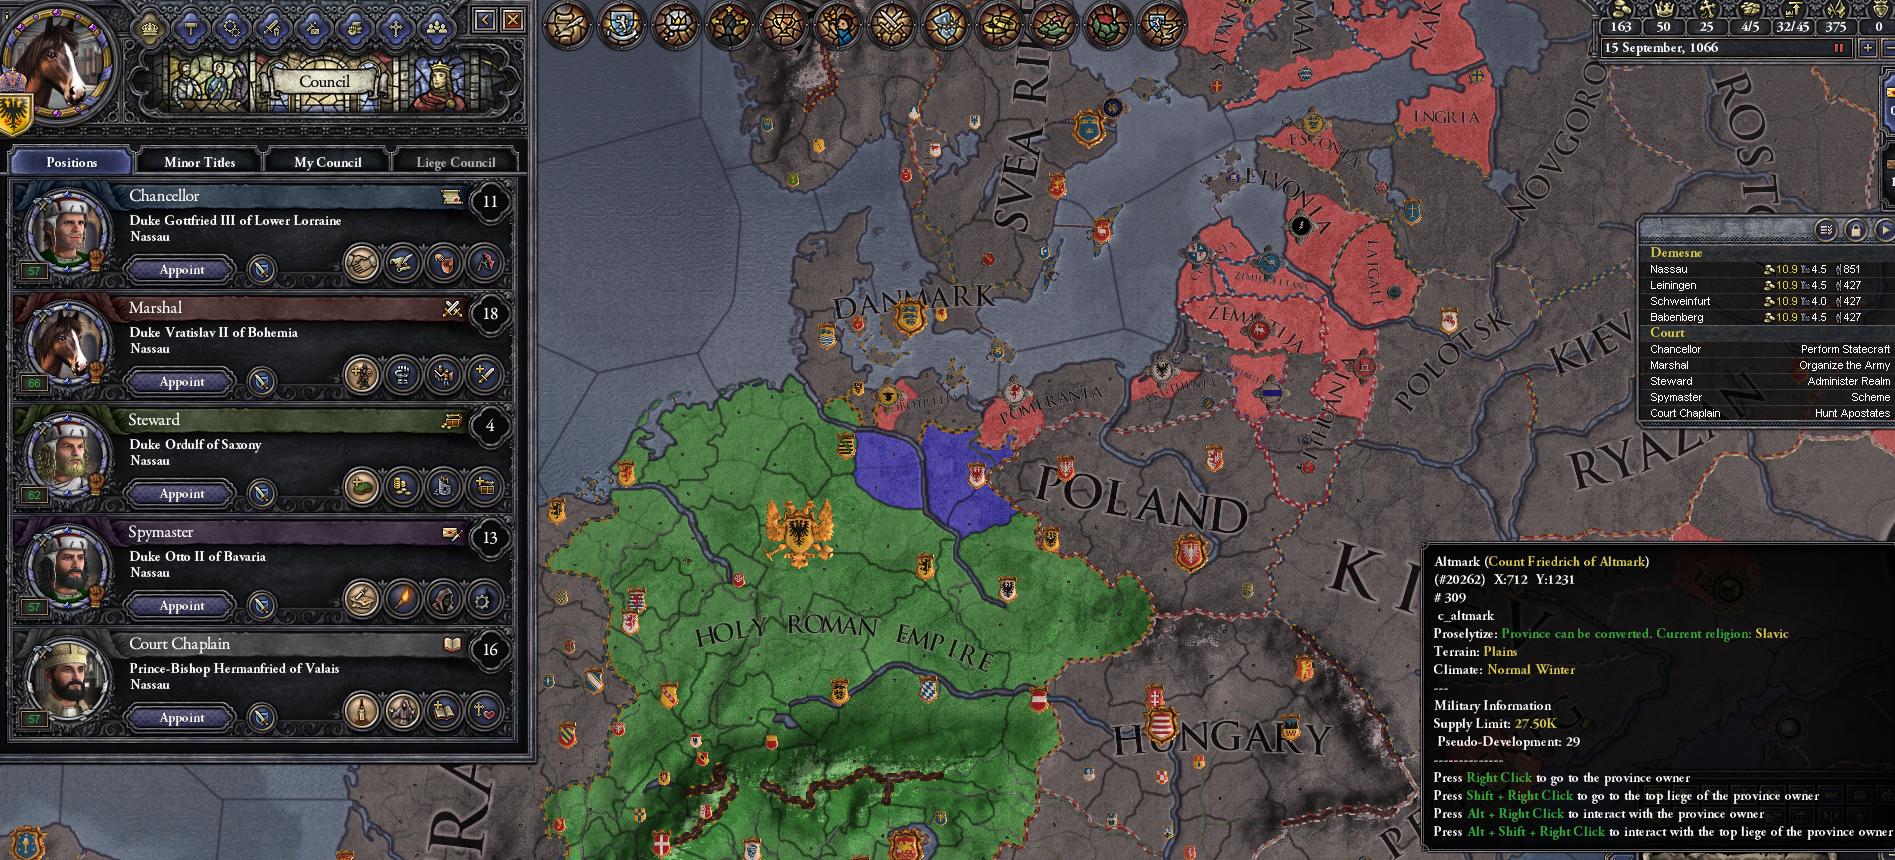 crusader kings 2 3.0.1.1 patch download